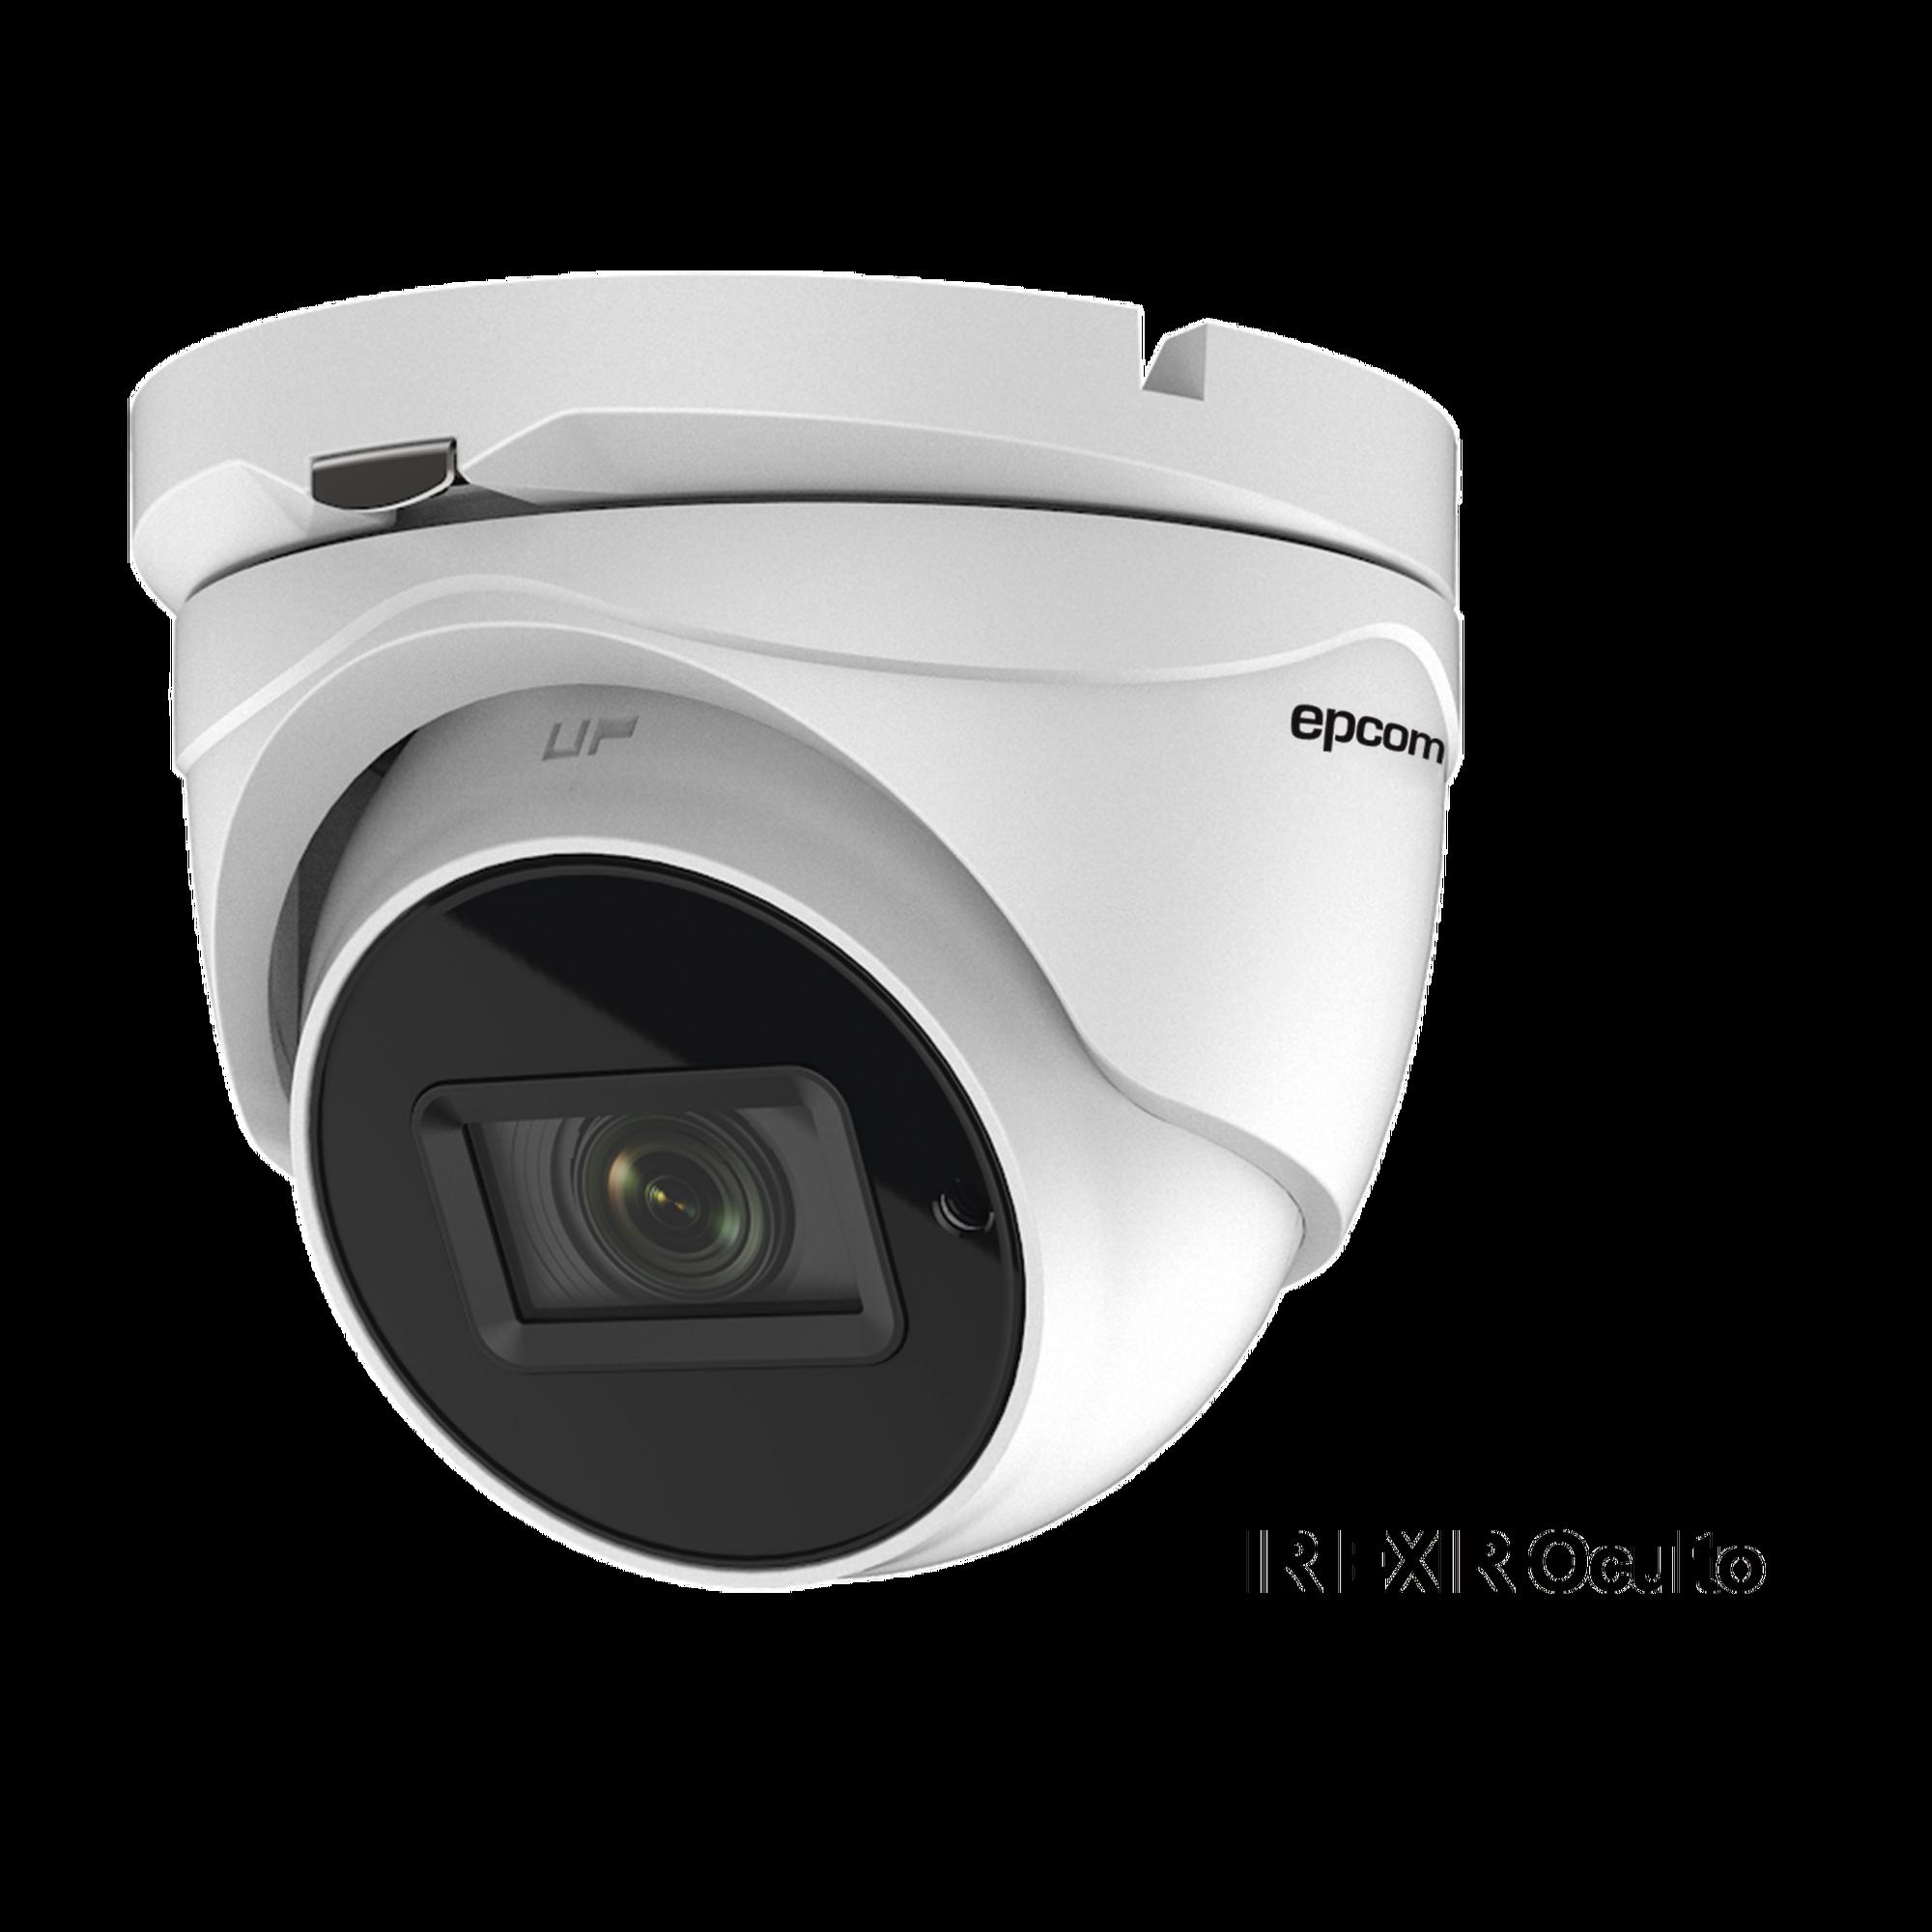 Eyeball 4K (8 Megapixeles)TURBOHD / Lente Mot. 2.7 a 13.5 mm / Potente IR EXIR 60 mts / Exterior IP67 / 9 a 15 VCD